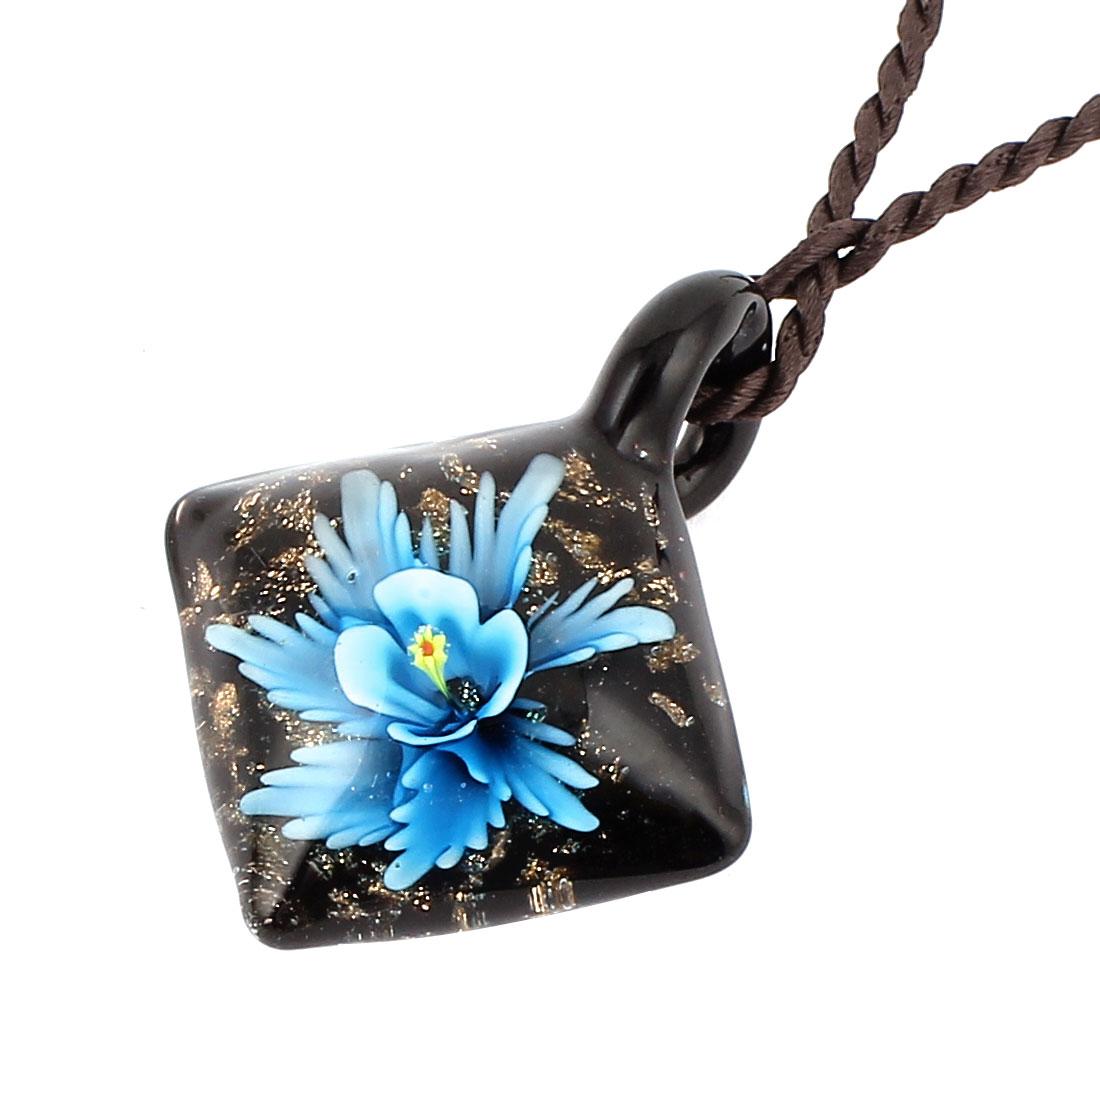 Square Glass Pressed Flower Design Pendant Necklace Neckwear Black Blue